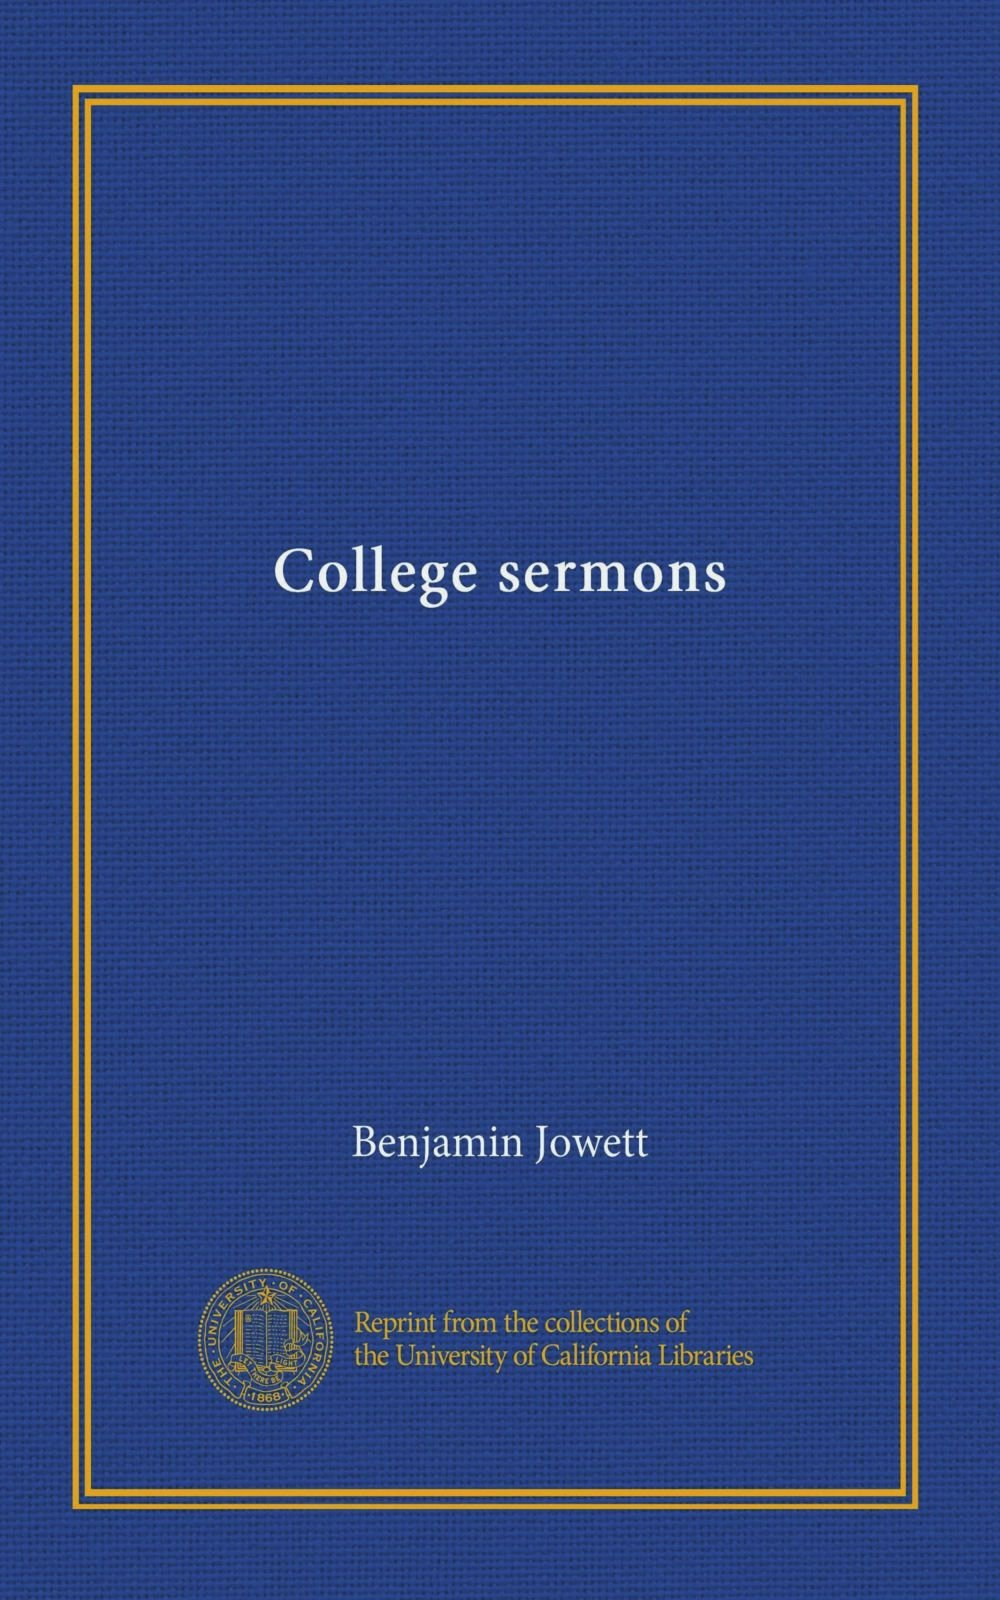 Download College sermons ebook